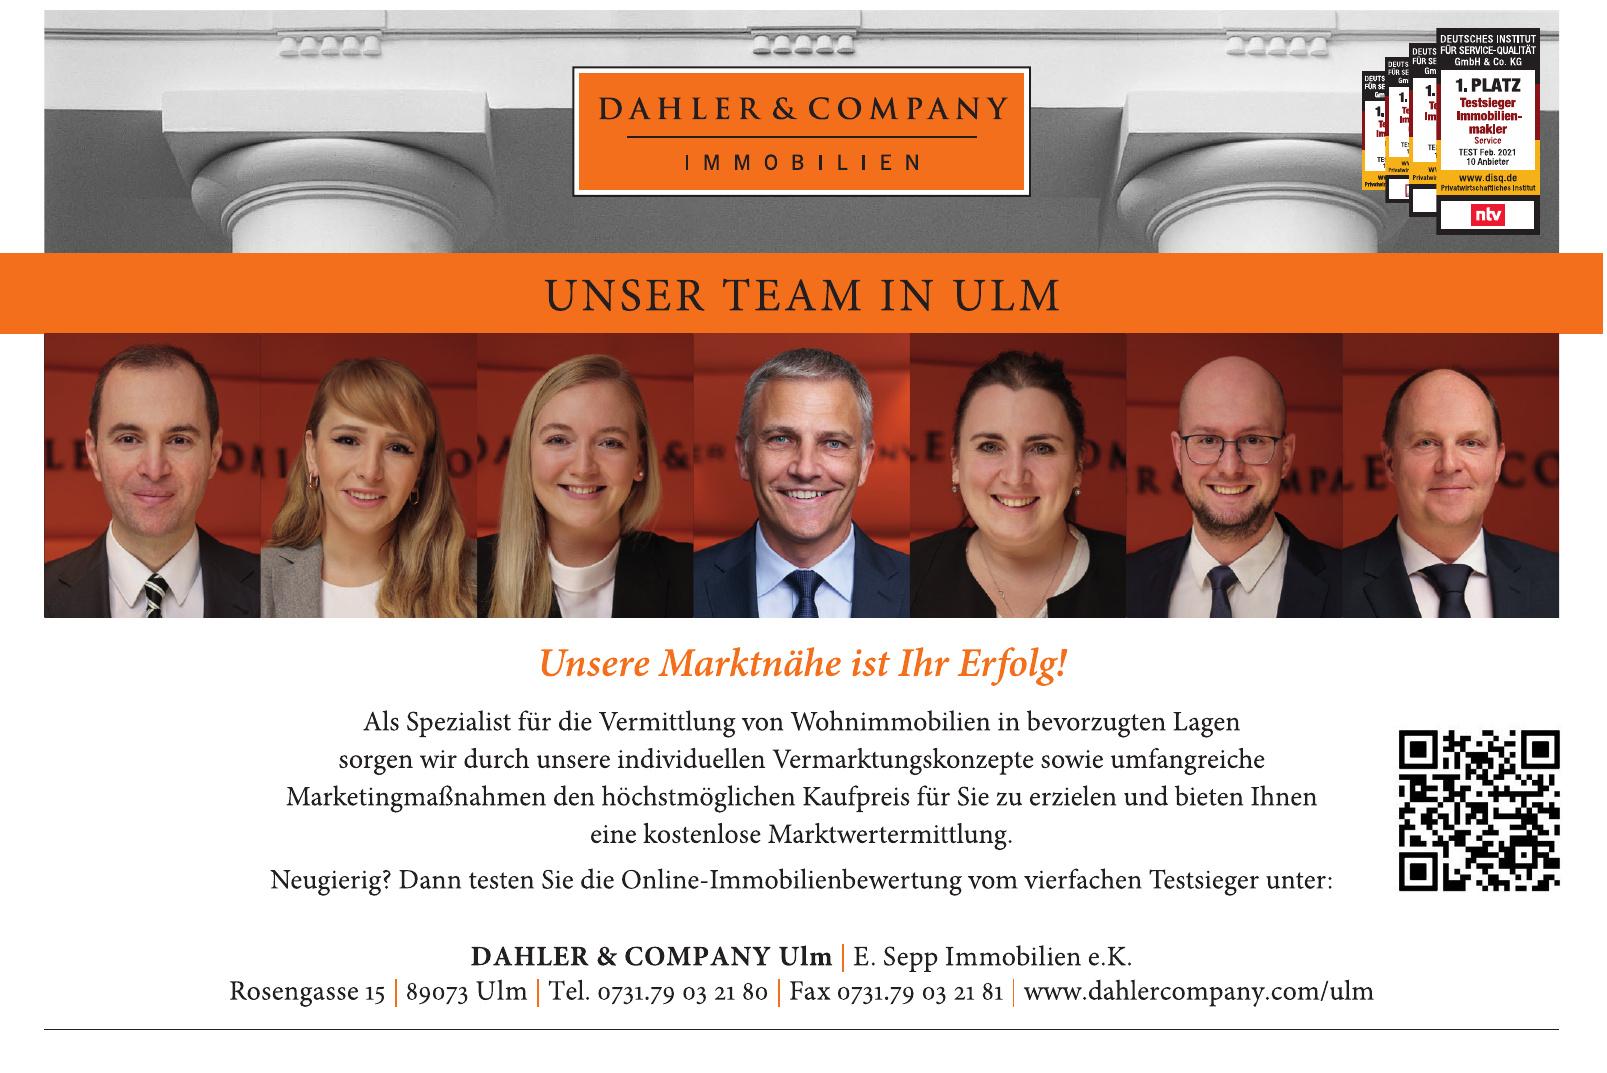 Dahler & Company Ulm